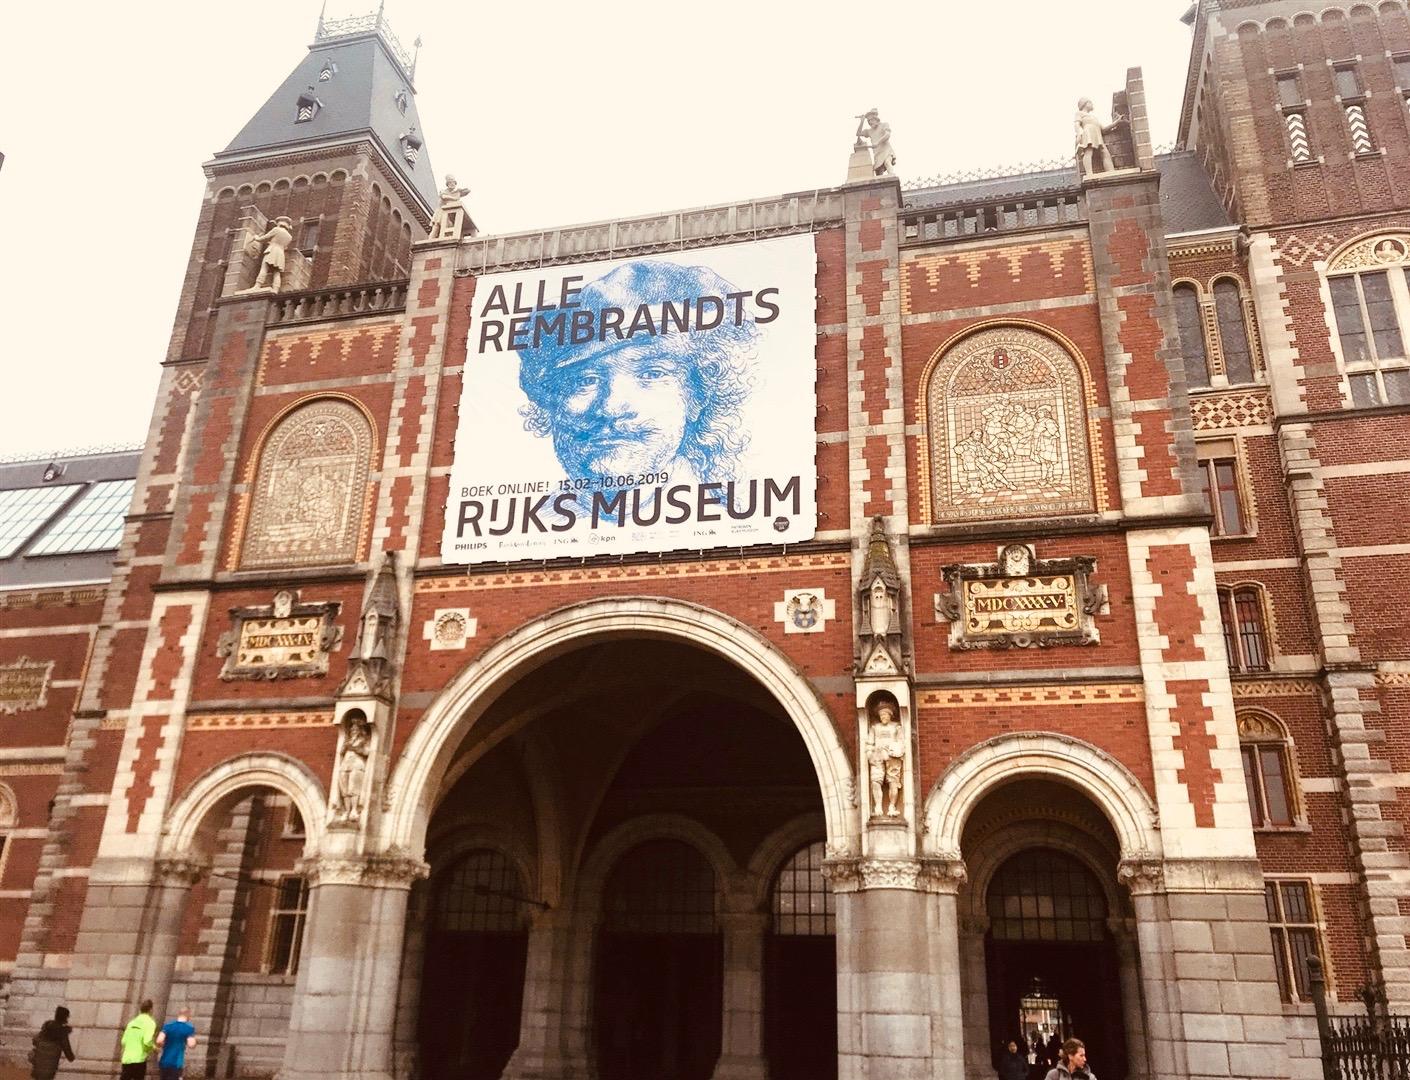 Rijks Museum exterior.jpeg